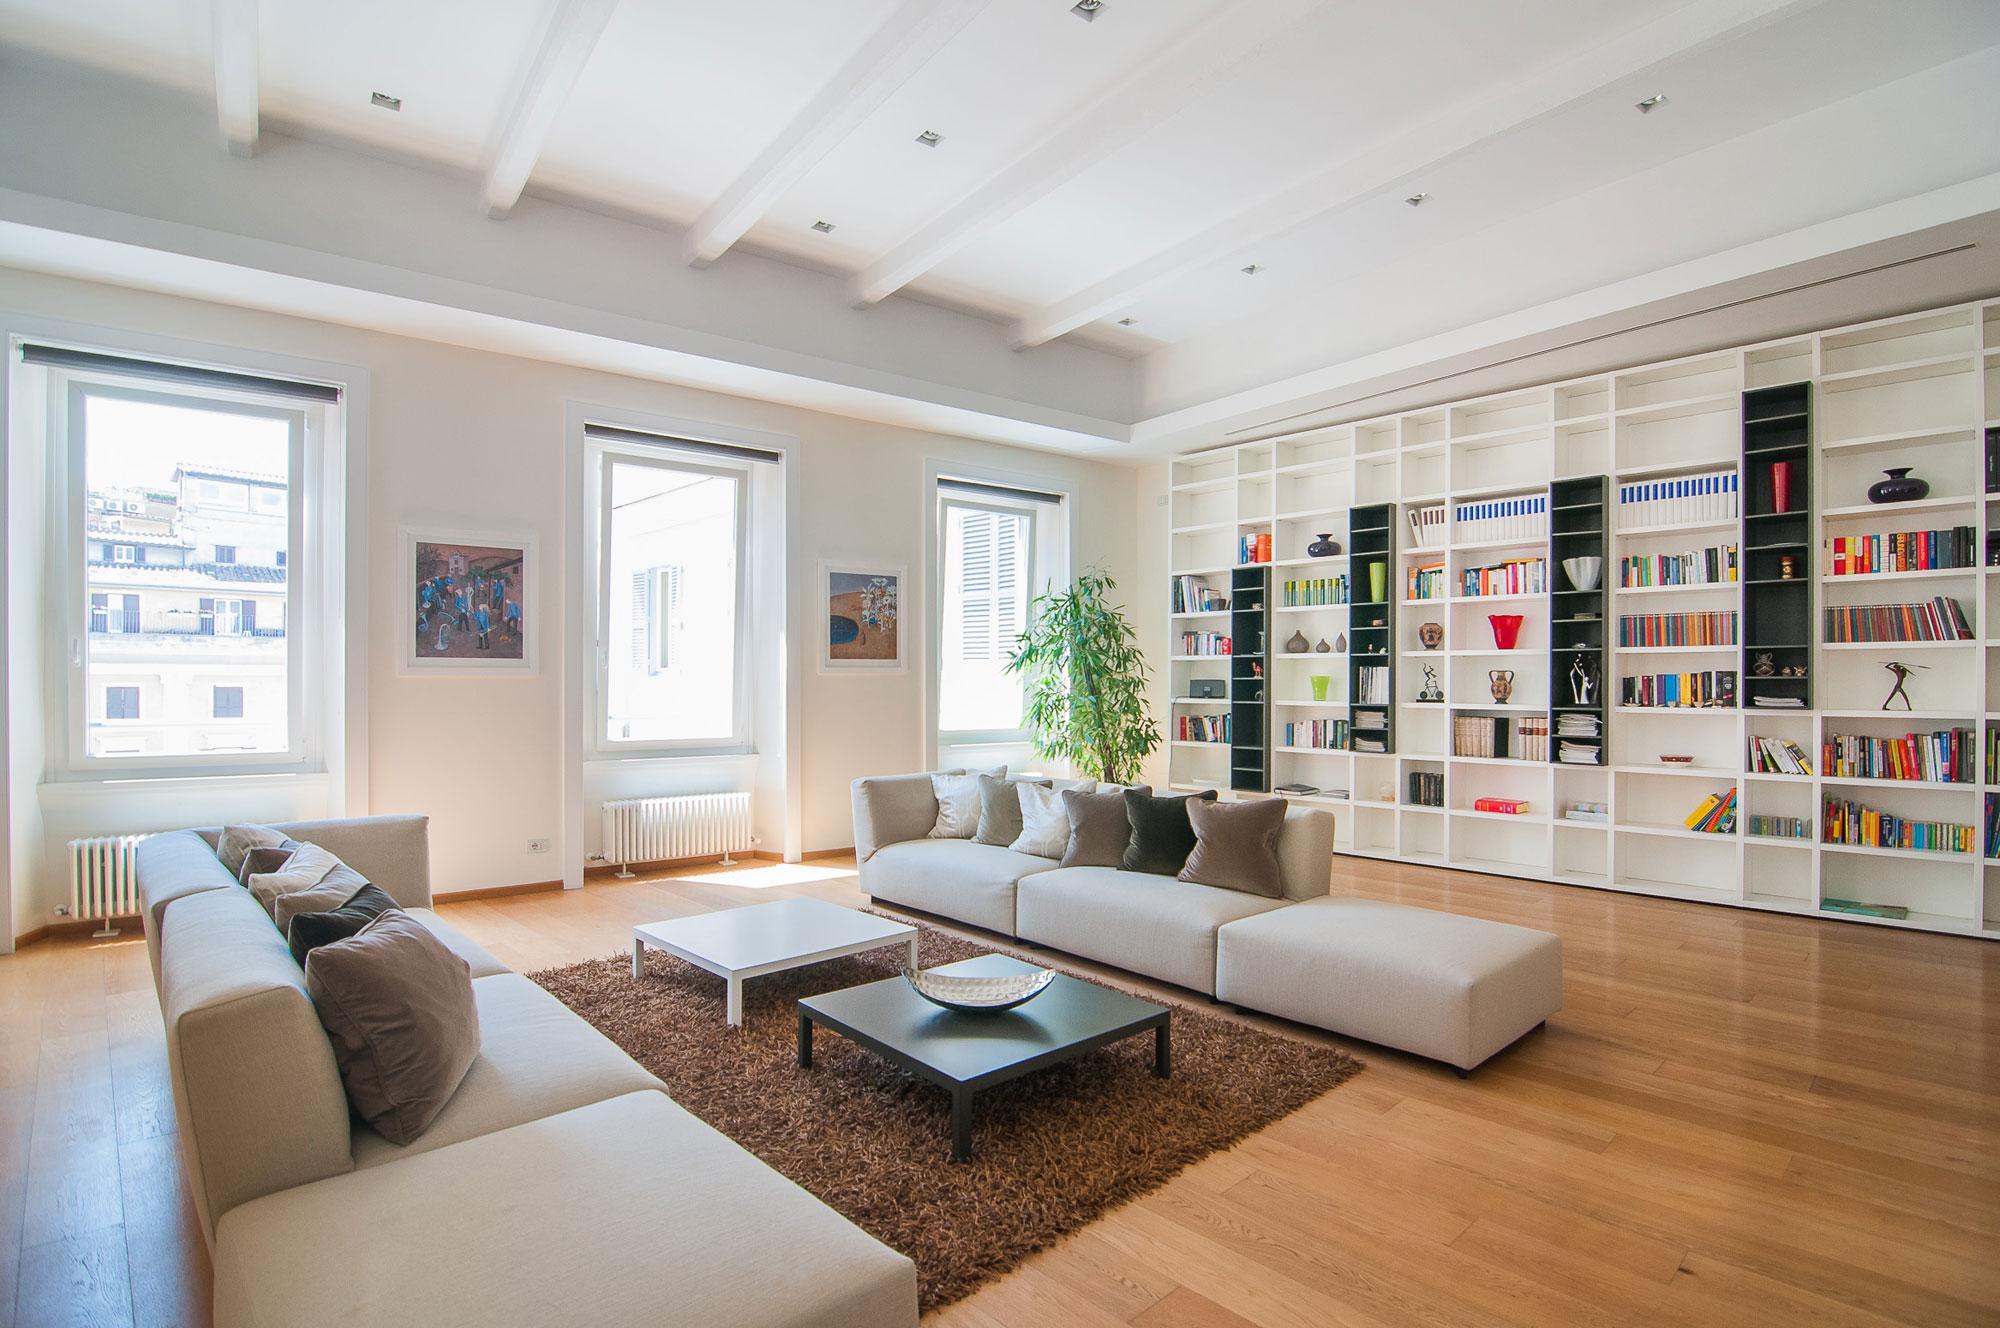 CM Apartment in Rome by 3C+t Capolei Cavalli a.a.-10